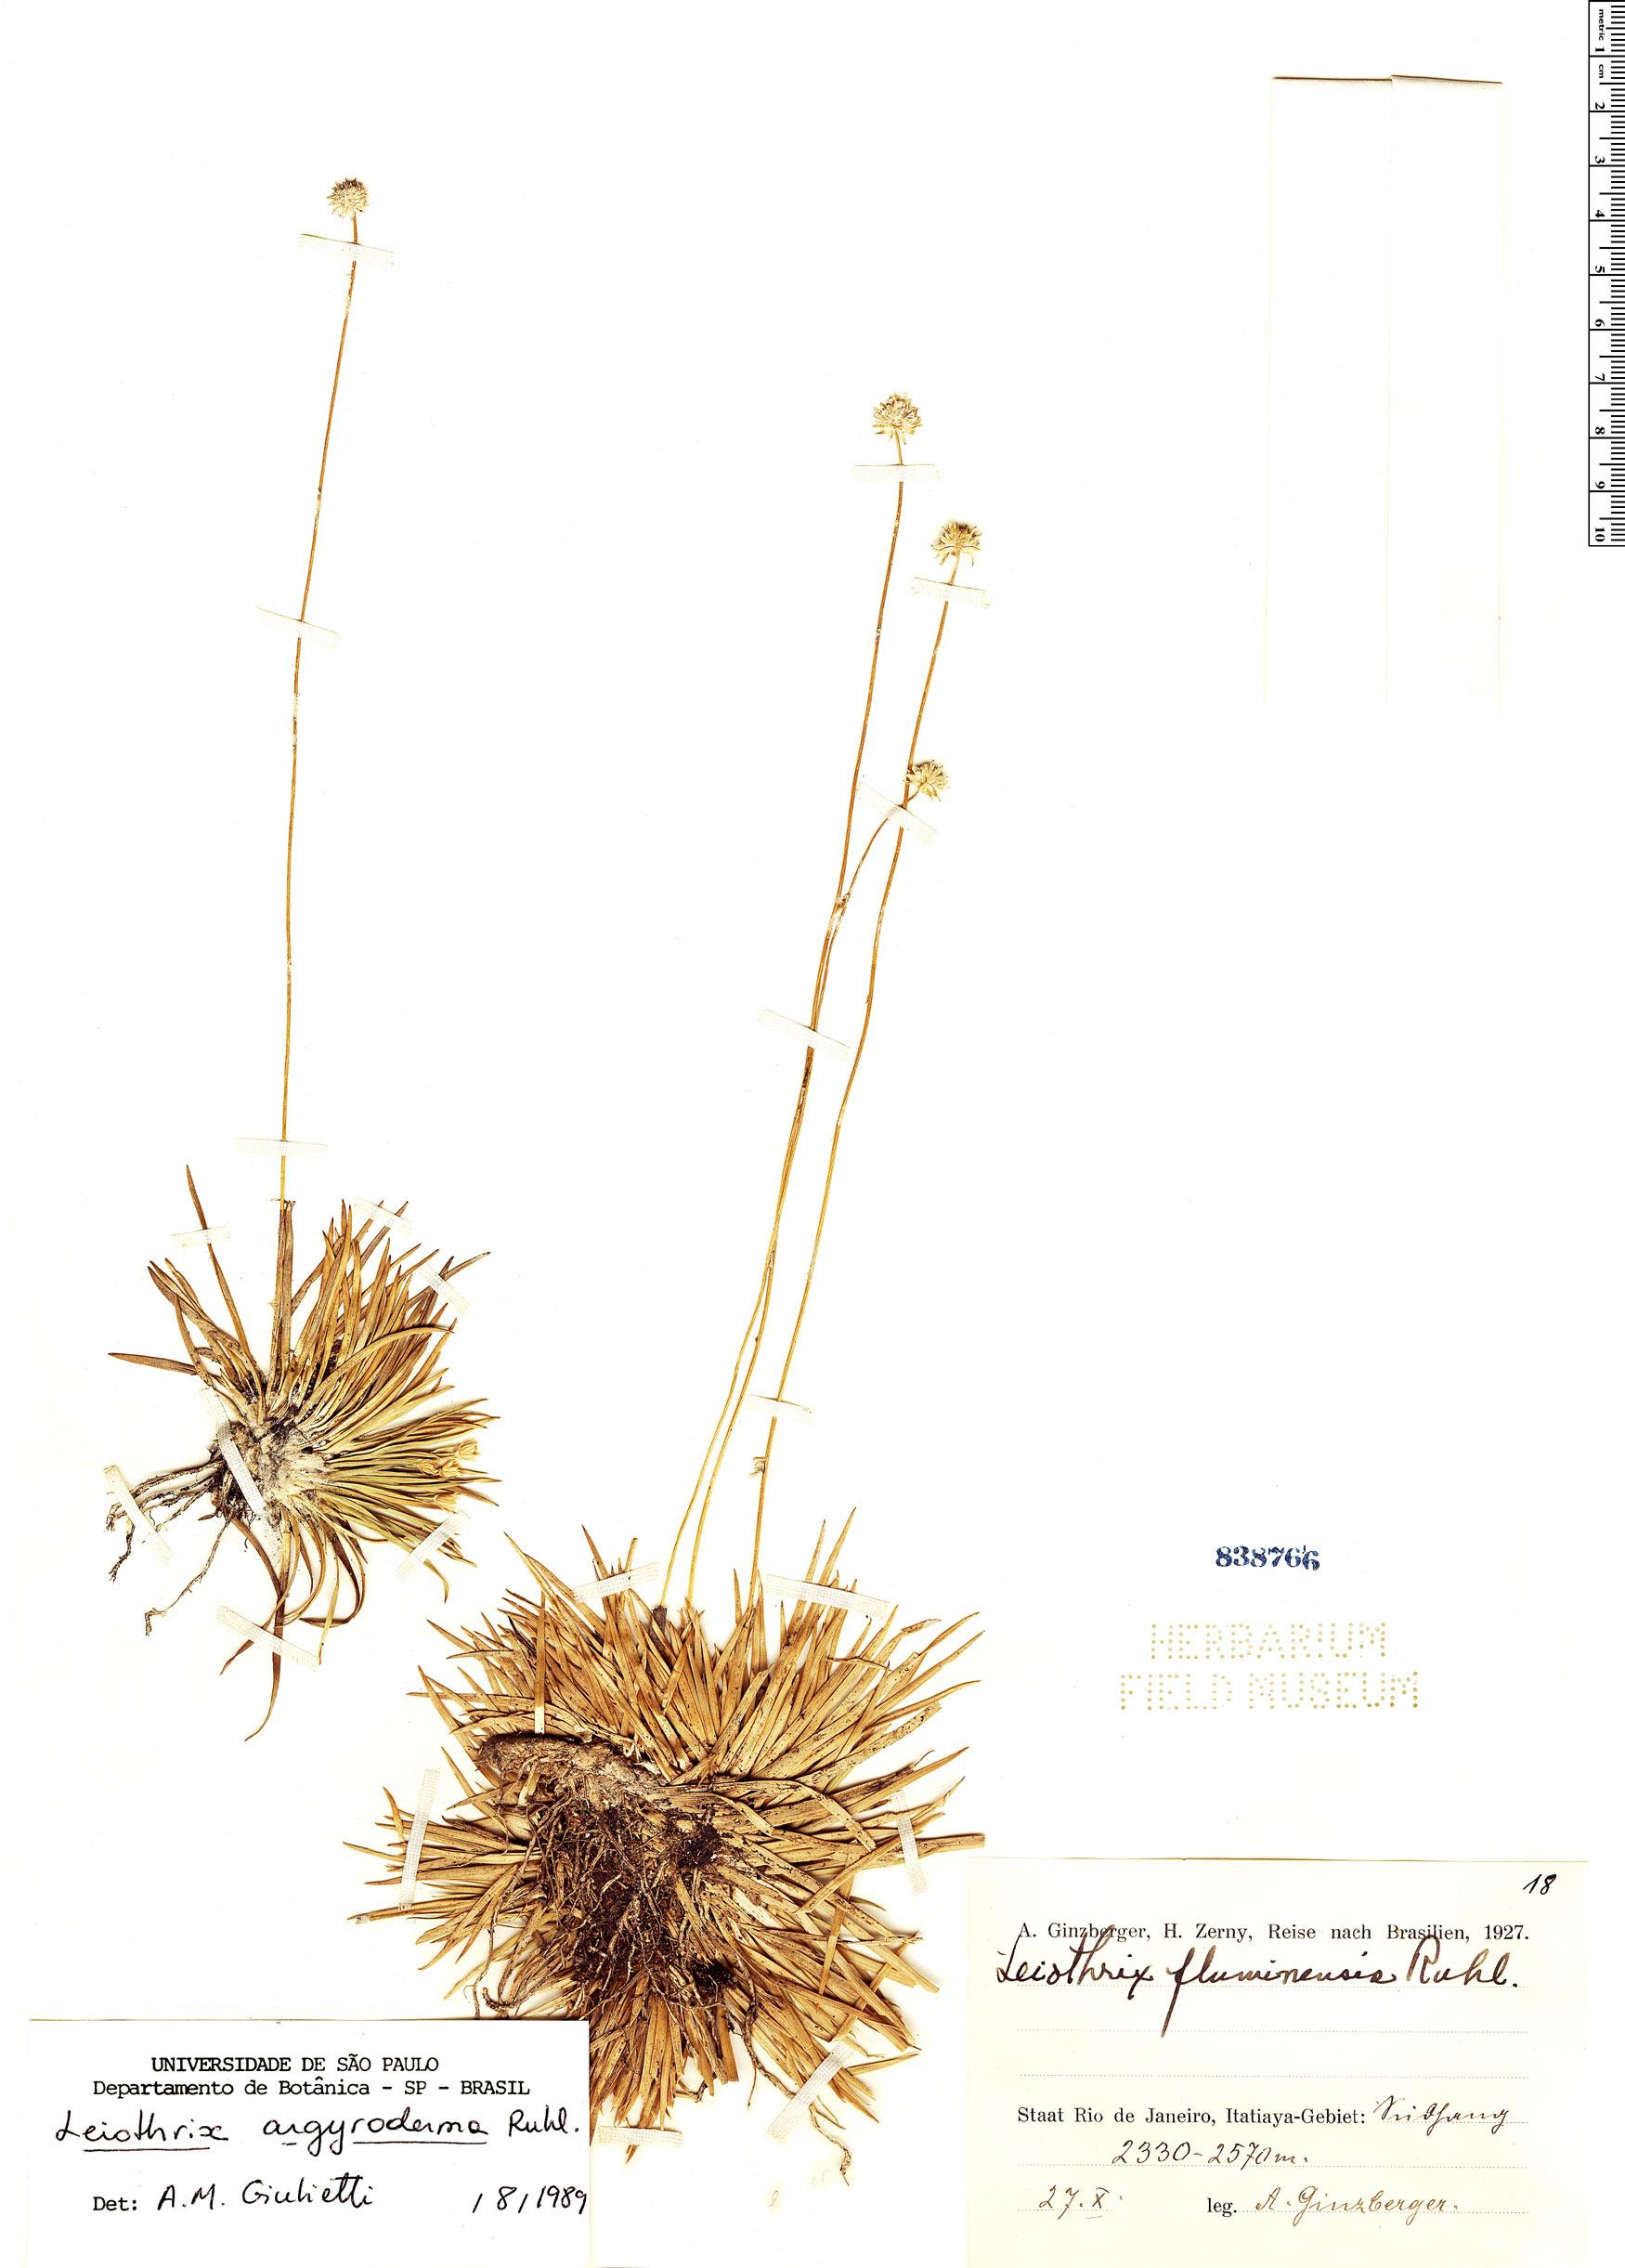 Specimen: Leiothrix argyroderma